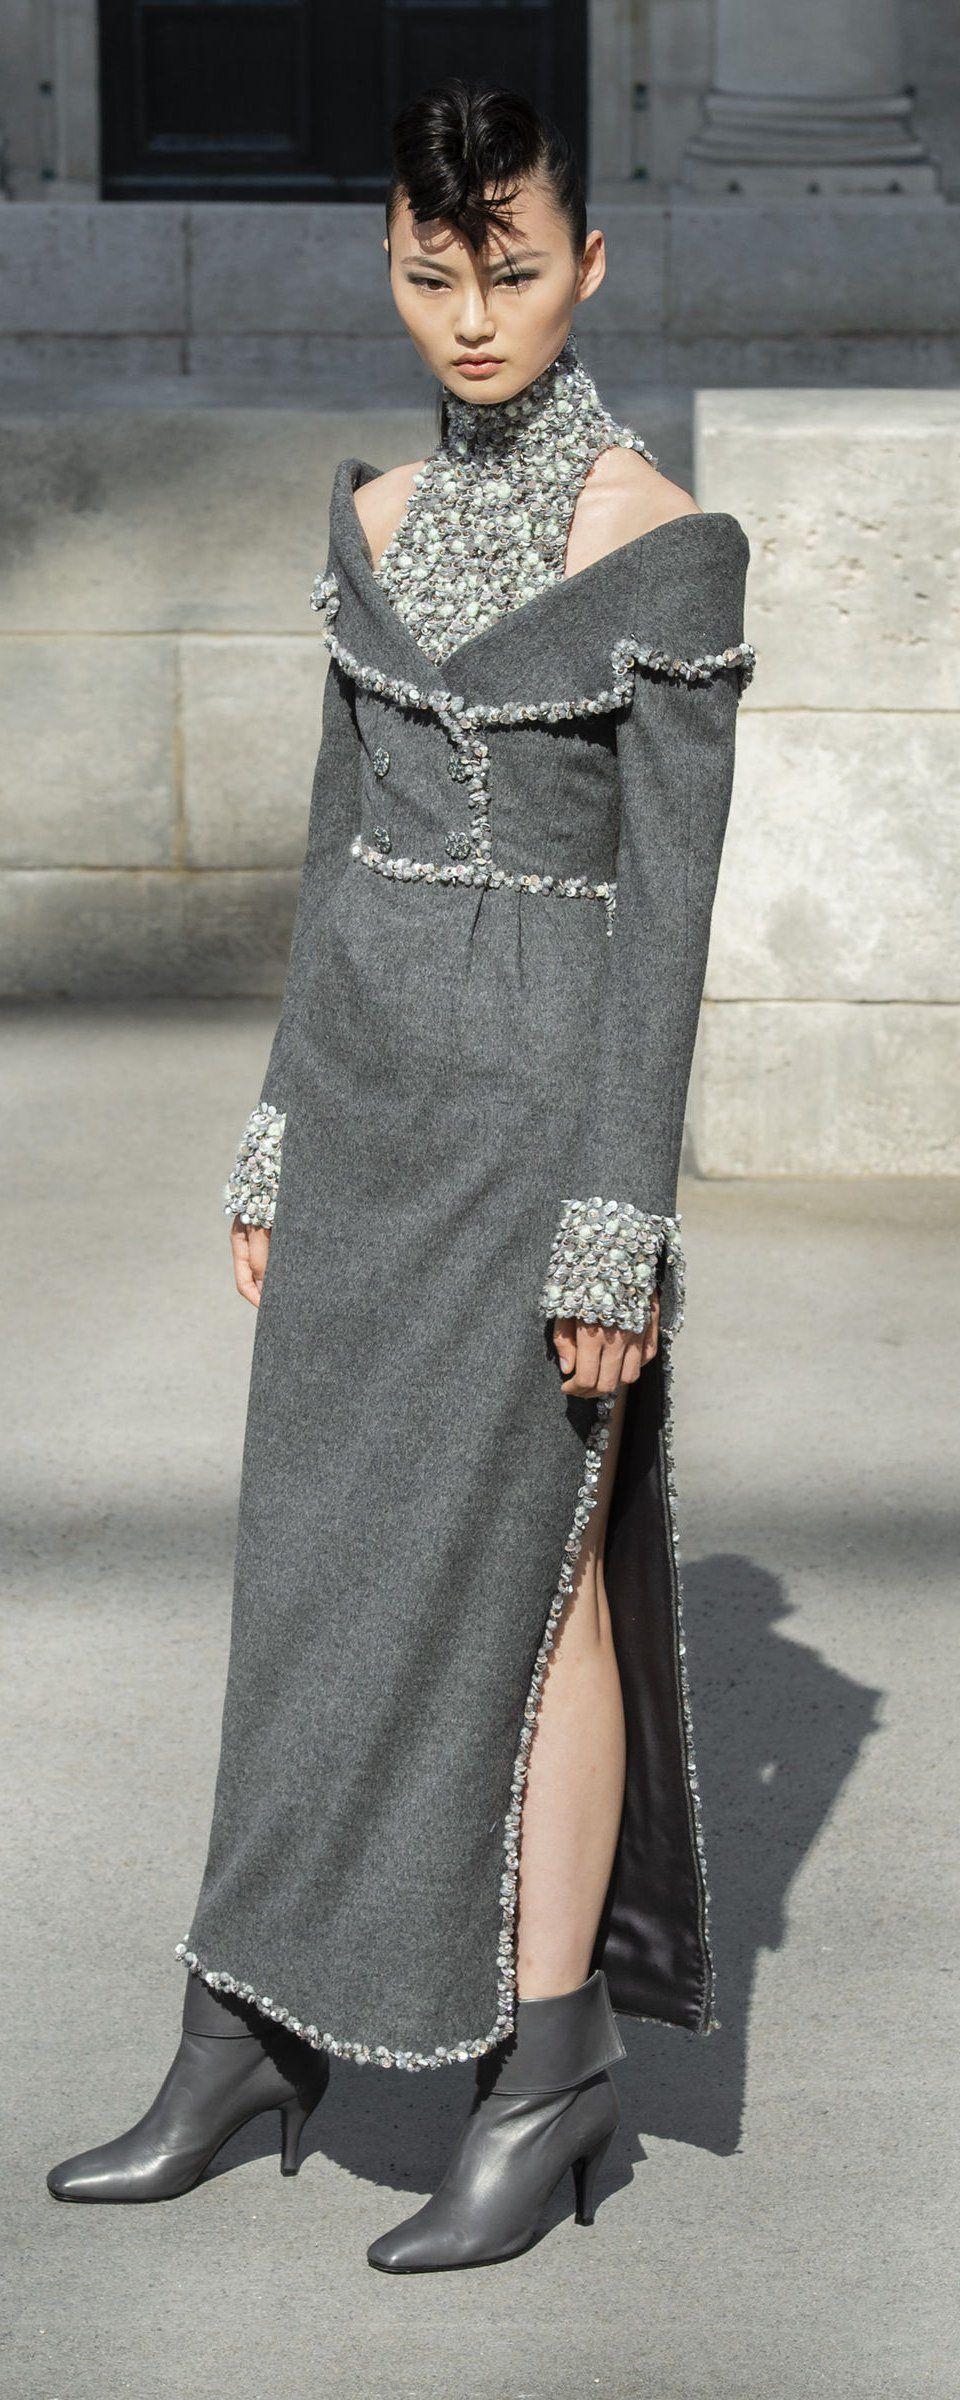 Chanel fallwinter couture in coco chanel ii